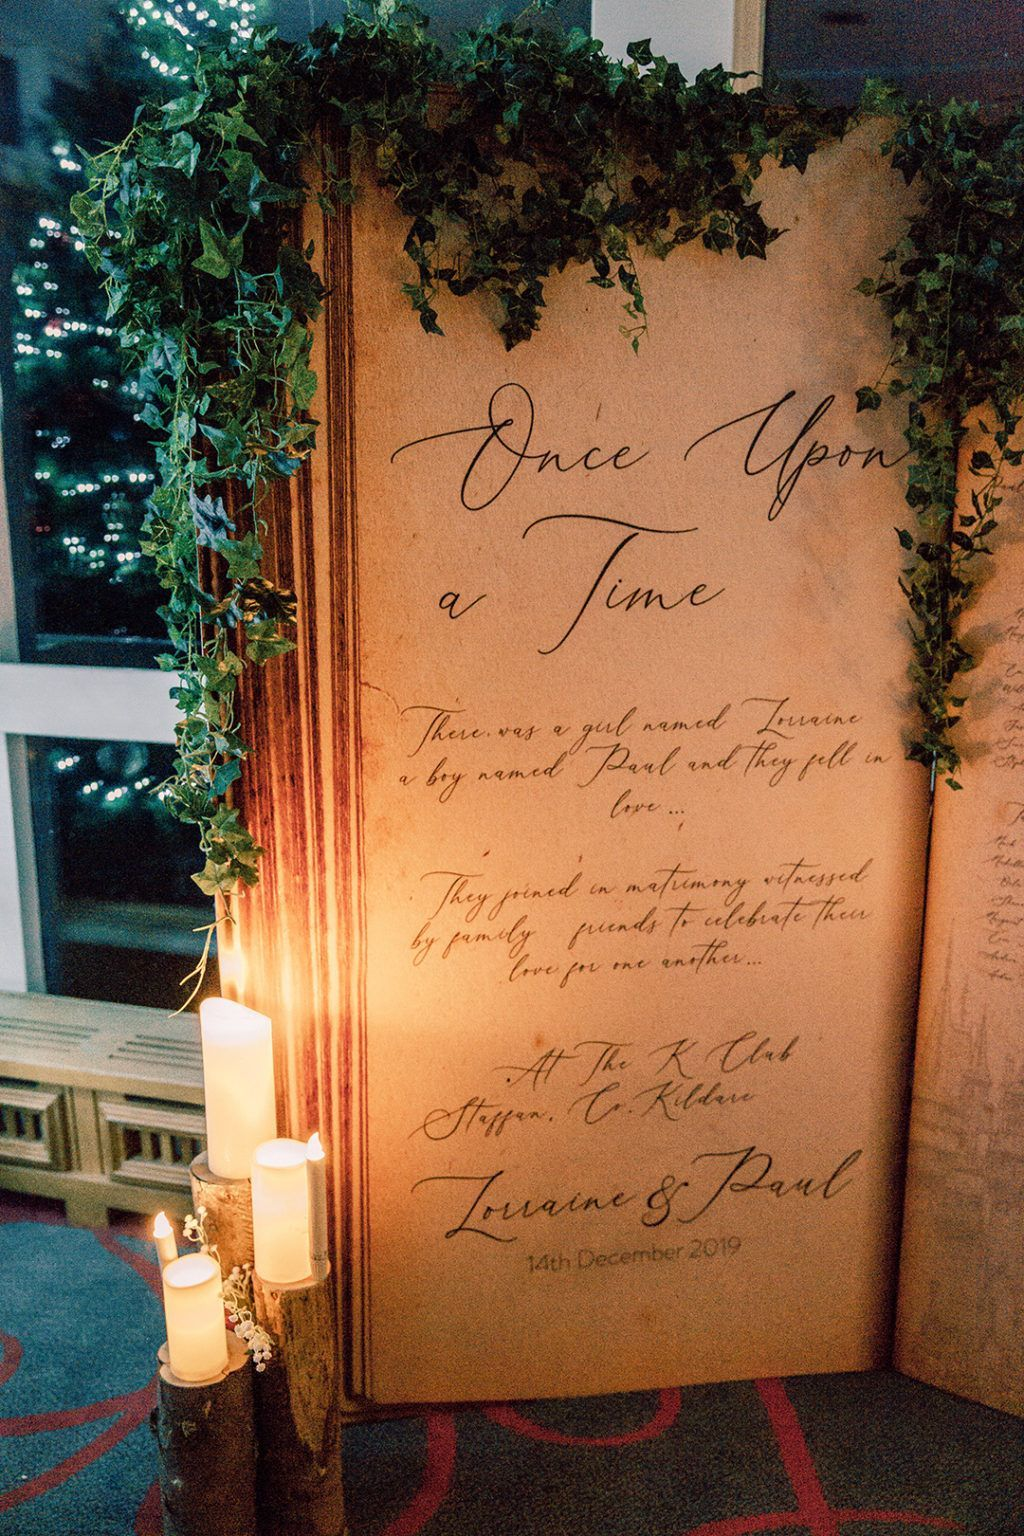 Lorraine Paul S Fairytale Christmas Wedding At The K Club One Fab Day Onefabday Com Ireland In 2020 Wedding Seating Cards Christmas Wedding Wedding